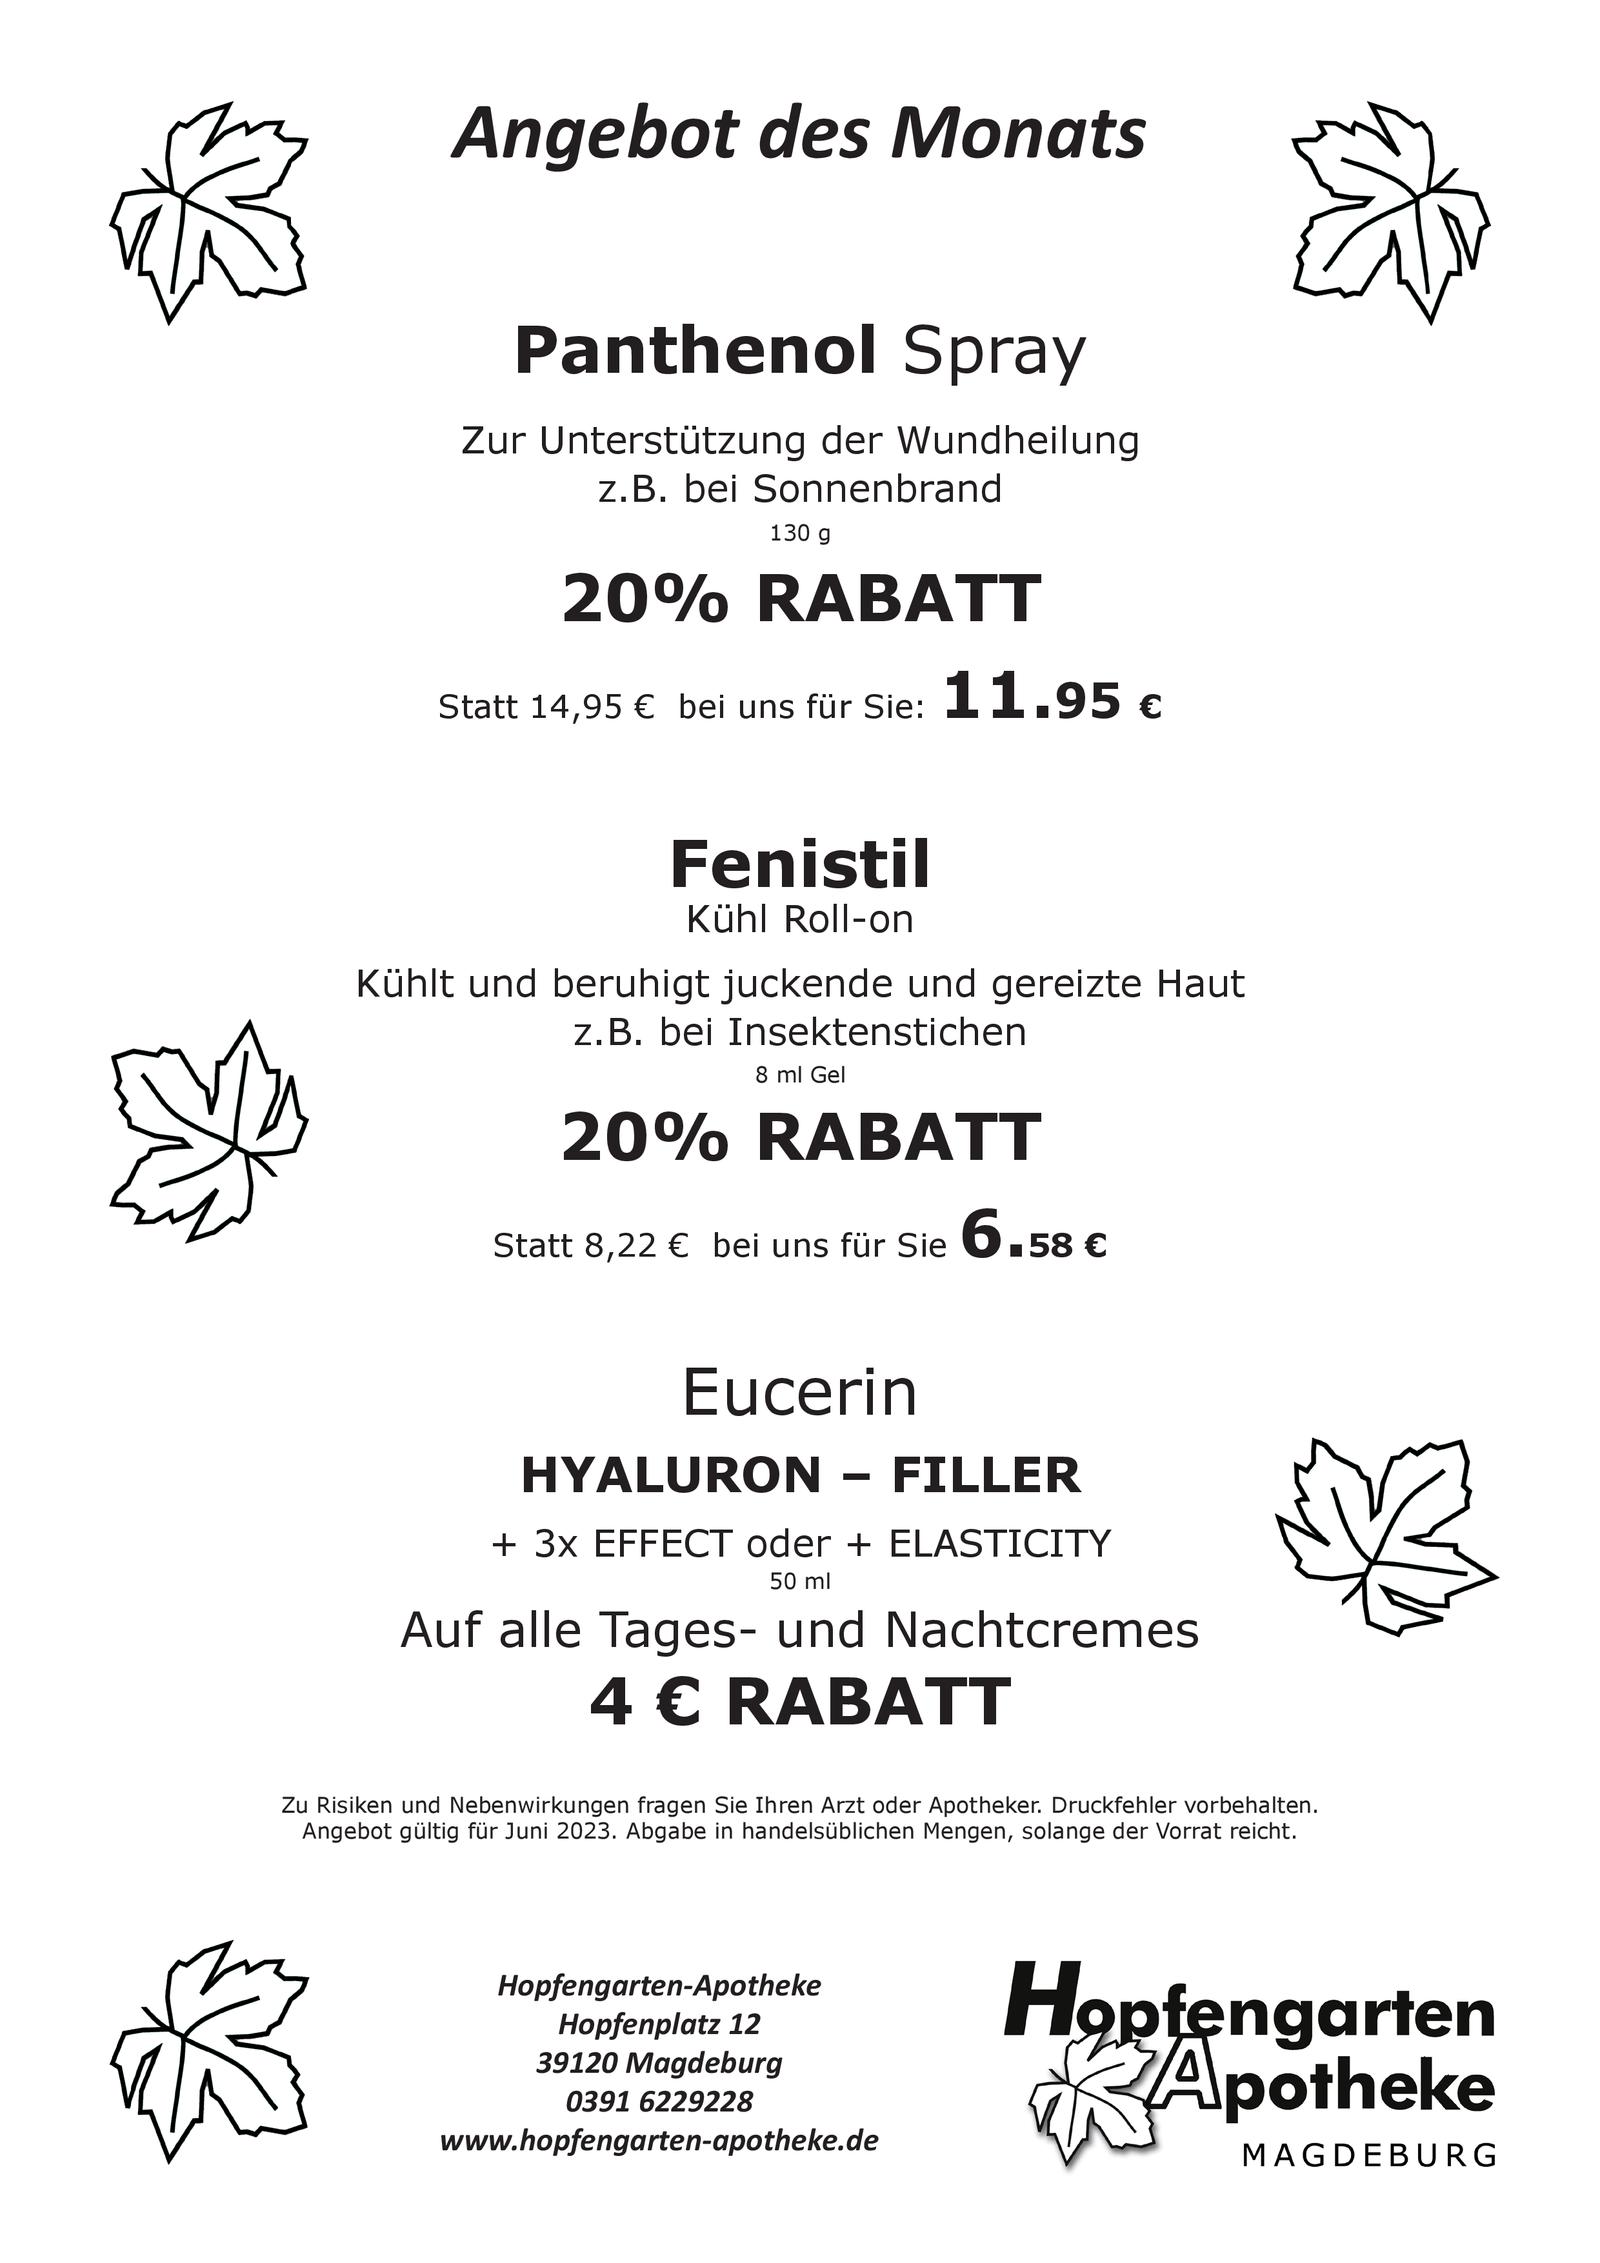 https://mein-uploads.apocdn.net/17917/leaflets/17917_flyer-Seite1.png